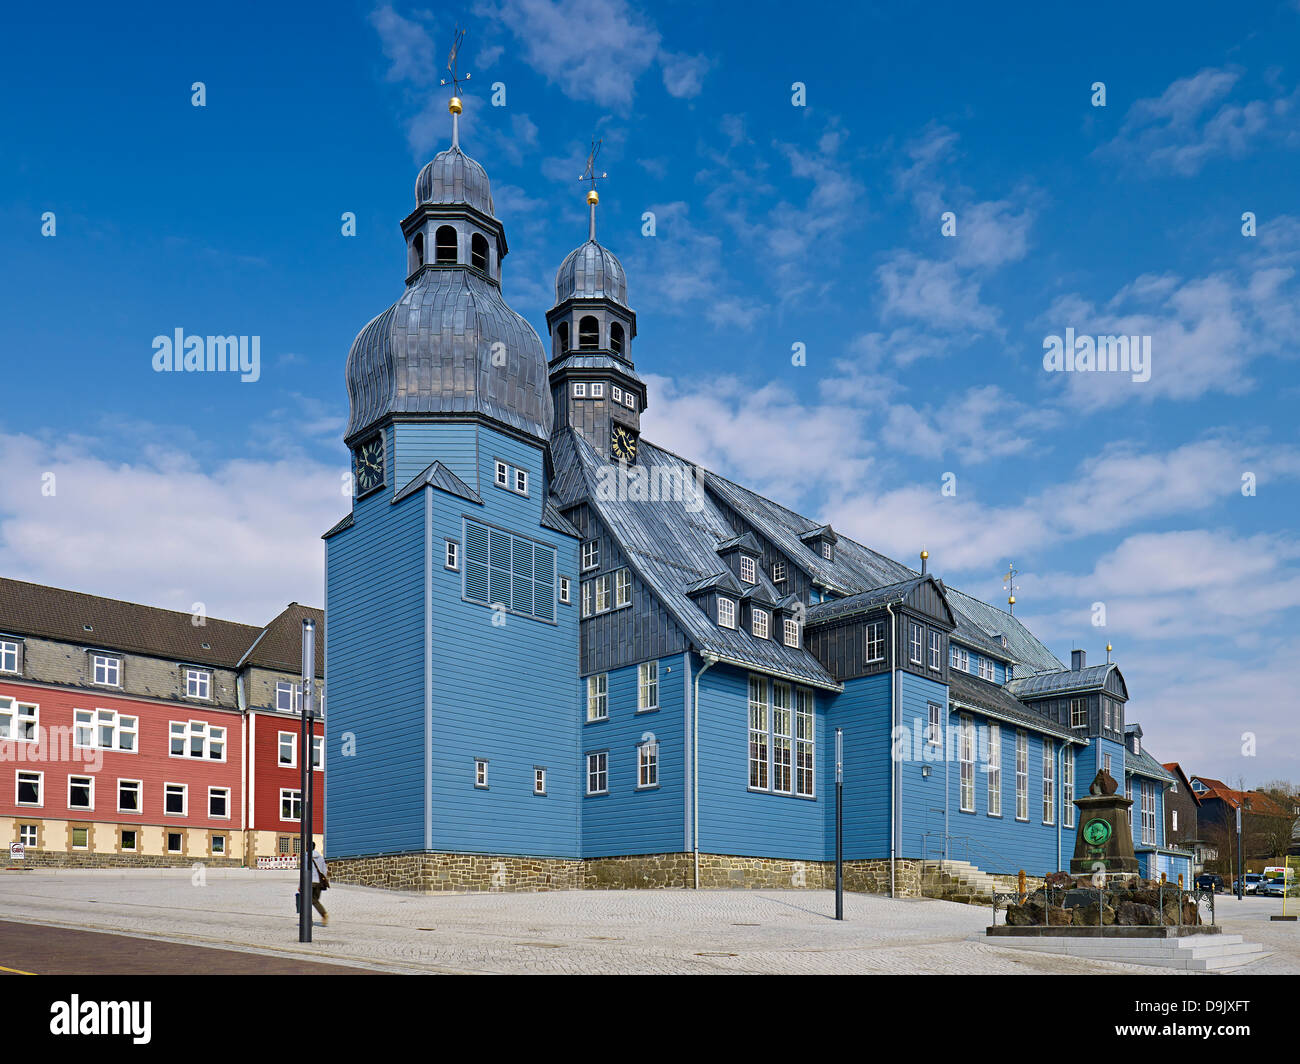 markt der heiliggeistkirche in clausthal clausthal zellerfeld goslar oberharz niedersachsen. Black Bedroom Furniture Sets. Home Design Ideas